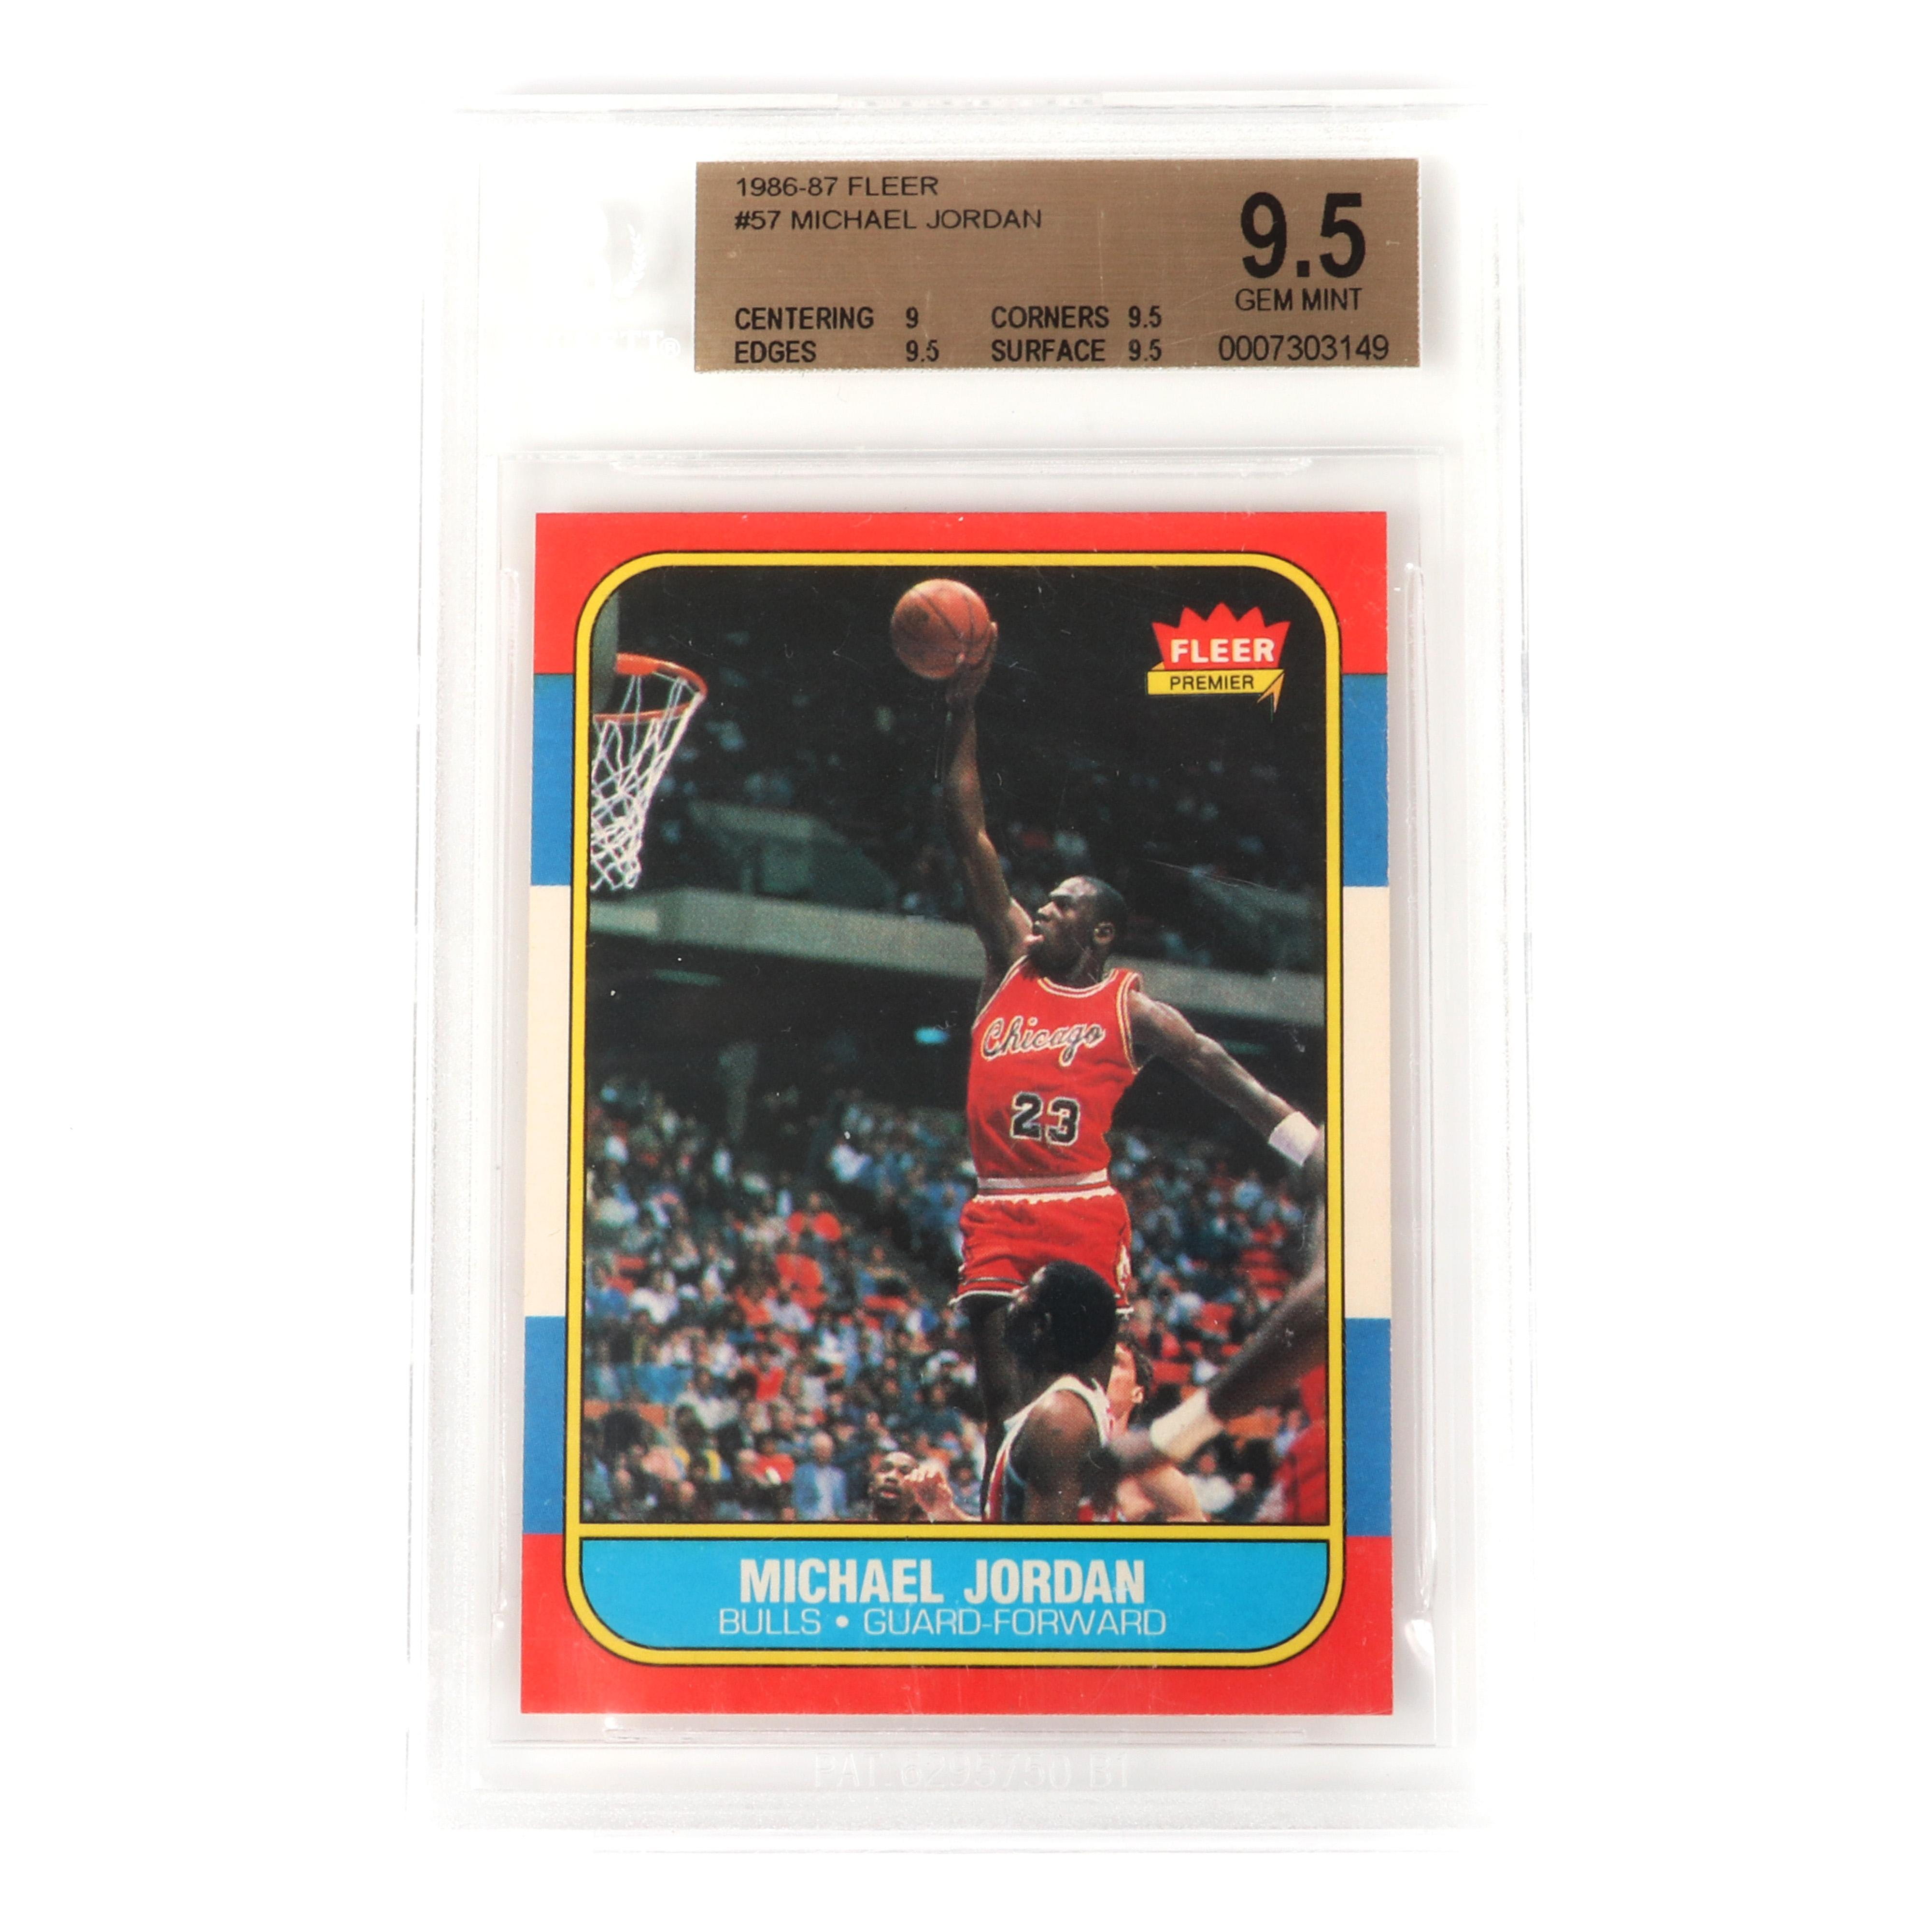 Michael Jordan 1986-87 Fleer Rookie Card #57 BGS 9.5 Gem Mint.